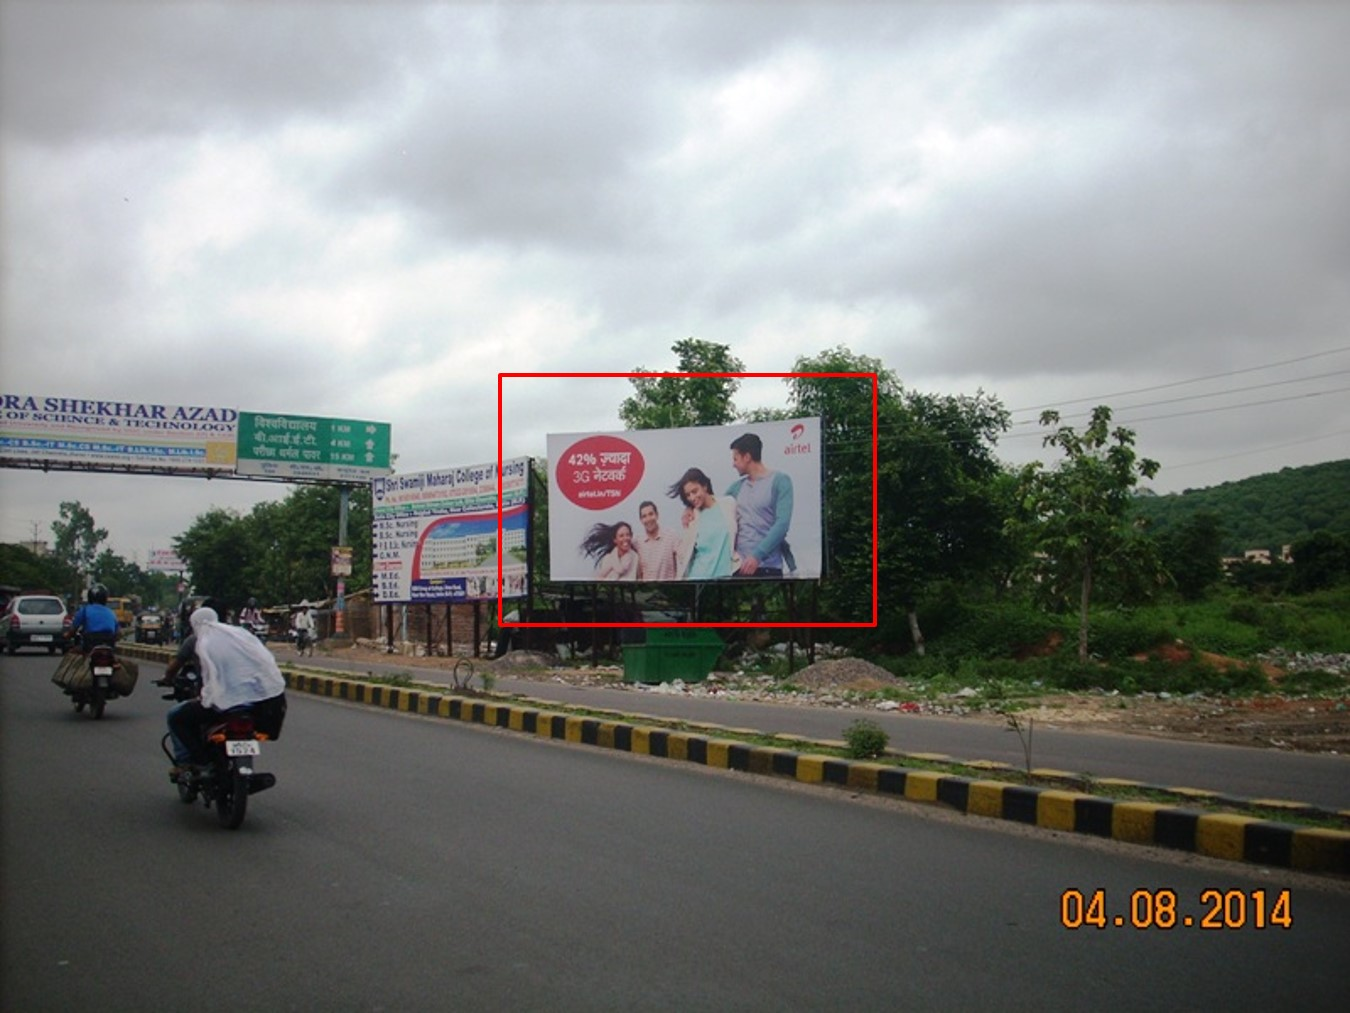 University, Jhansi